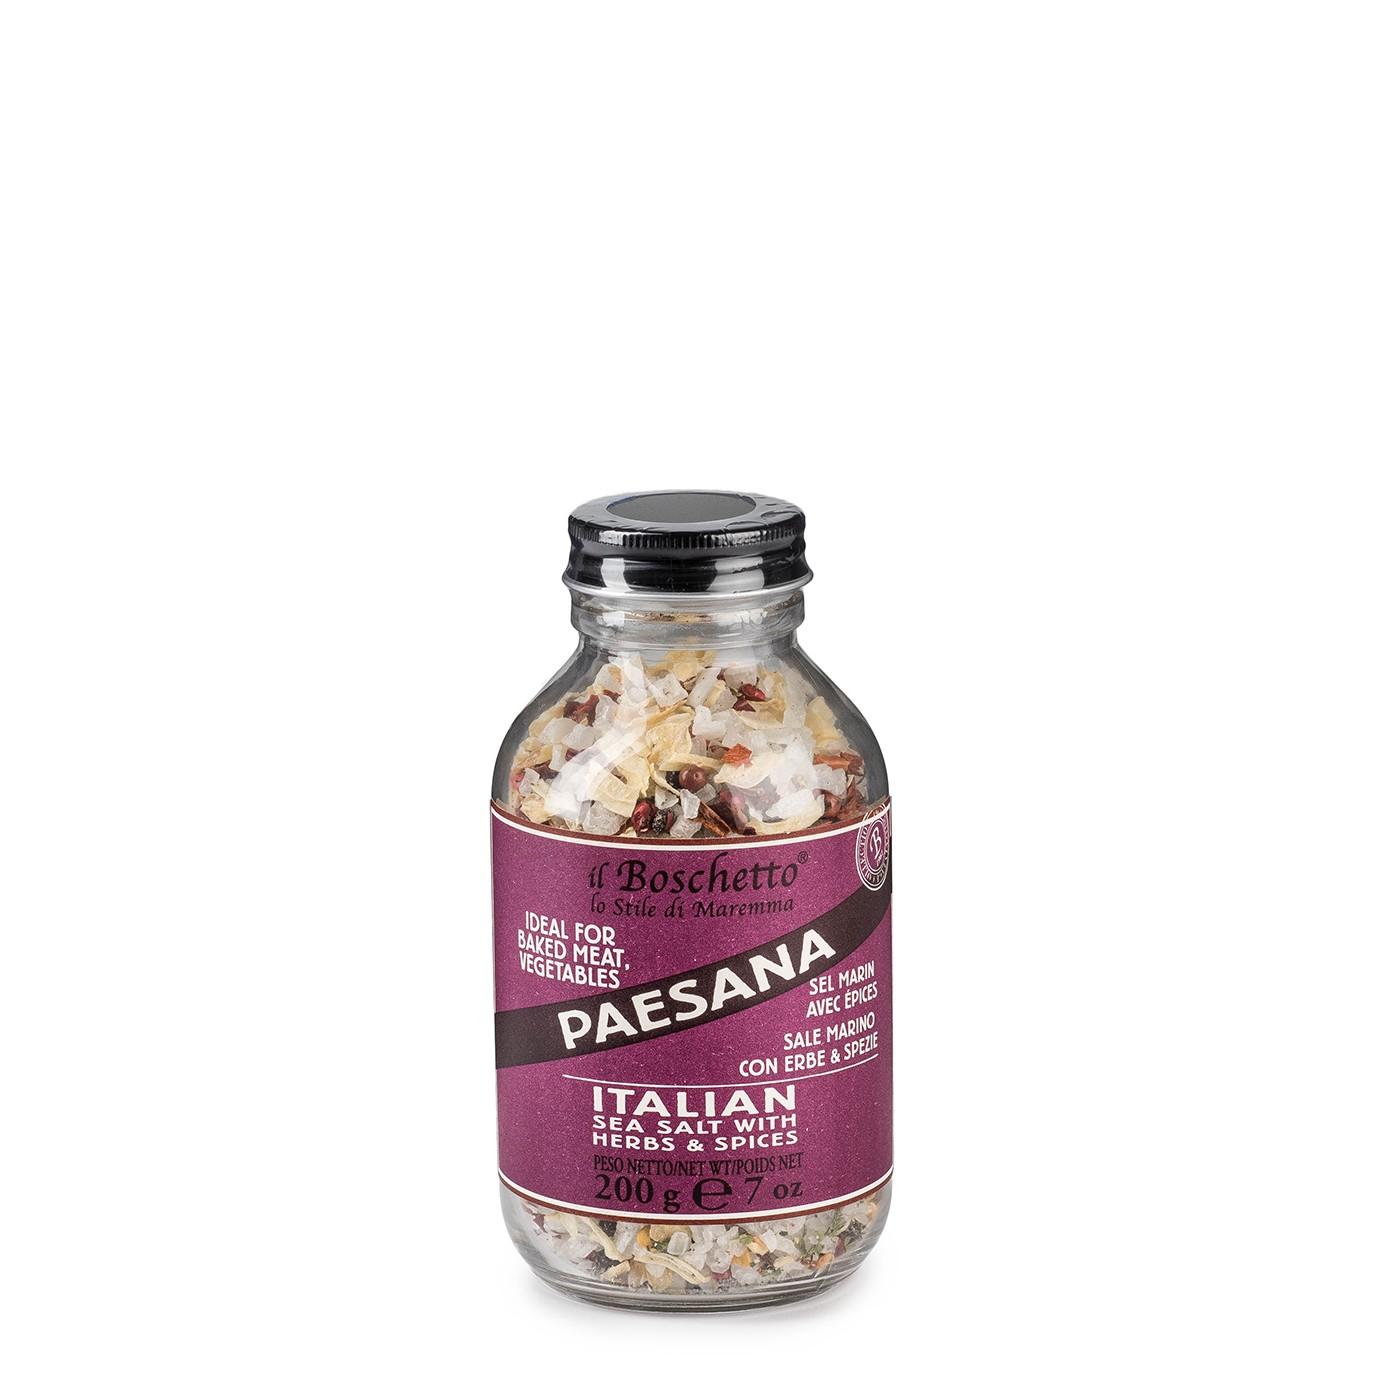 Paesana Sea Salt Mix 7.1 oz